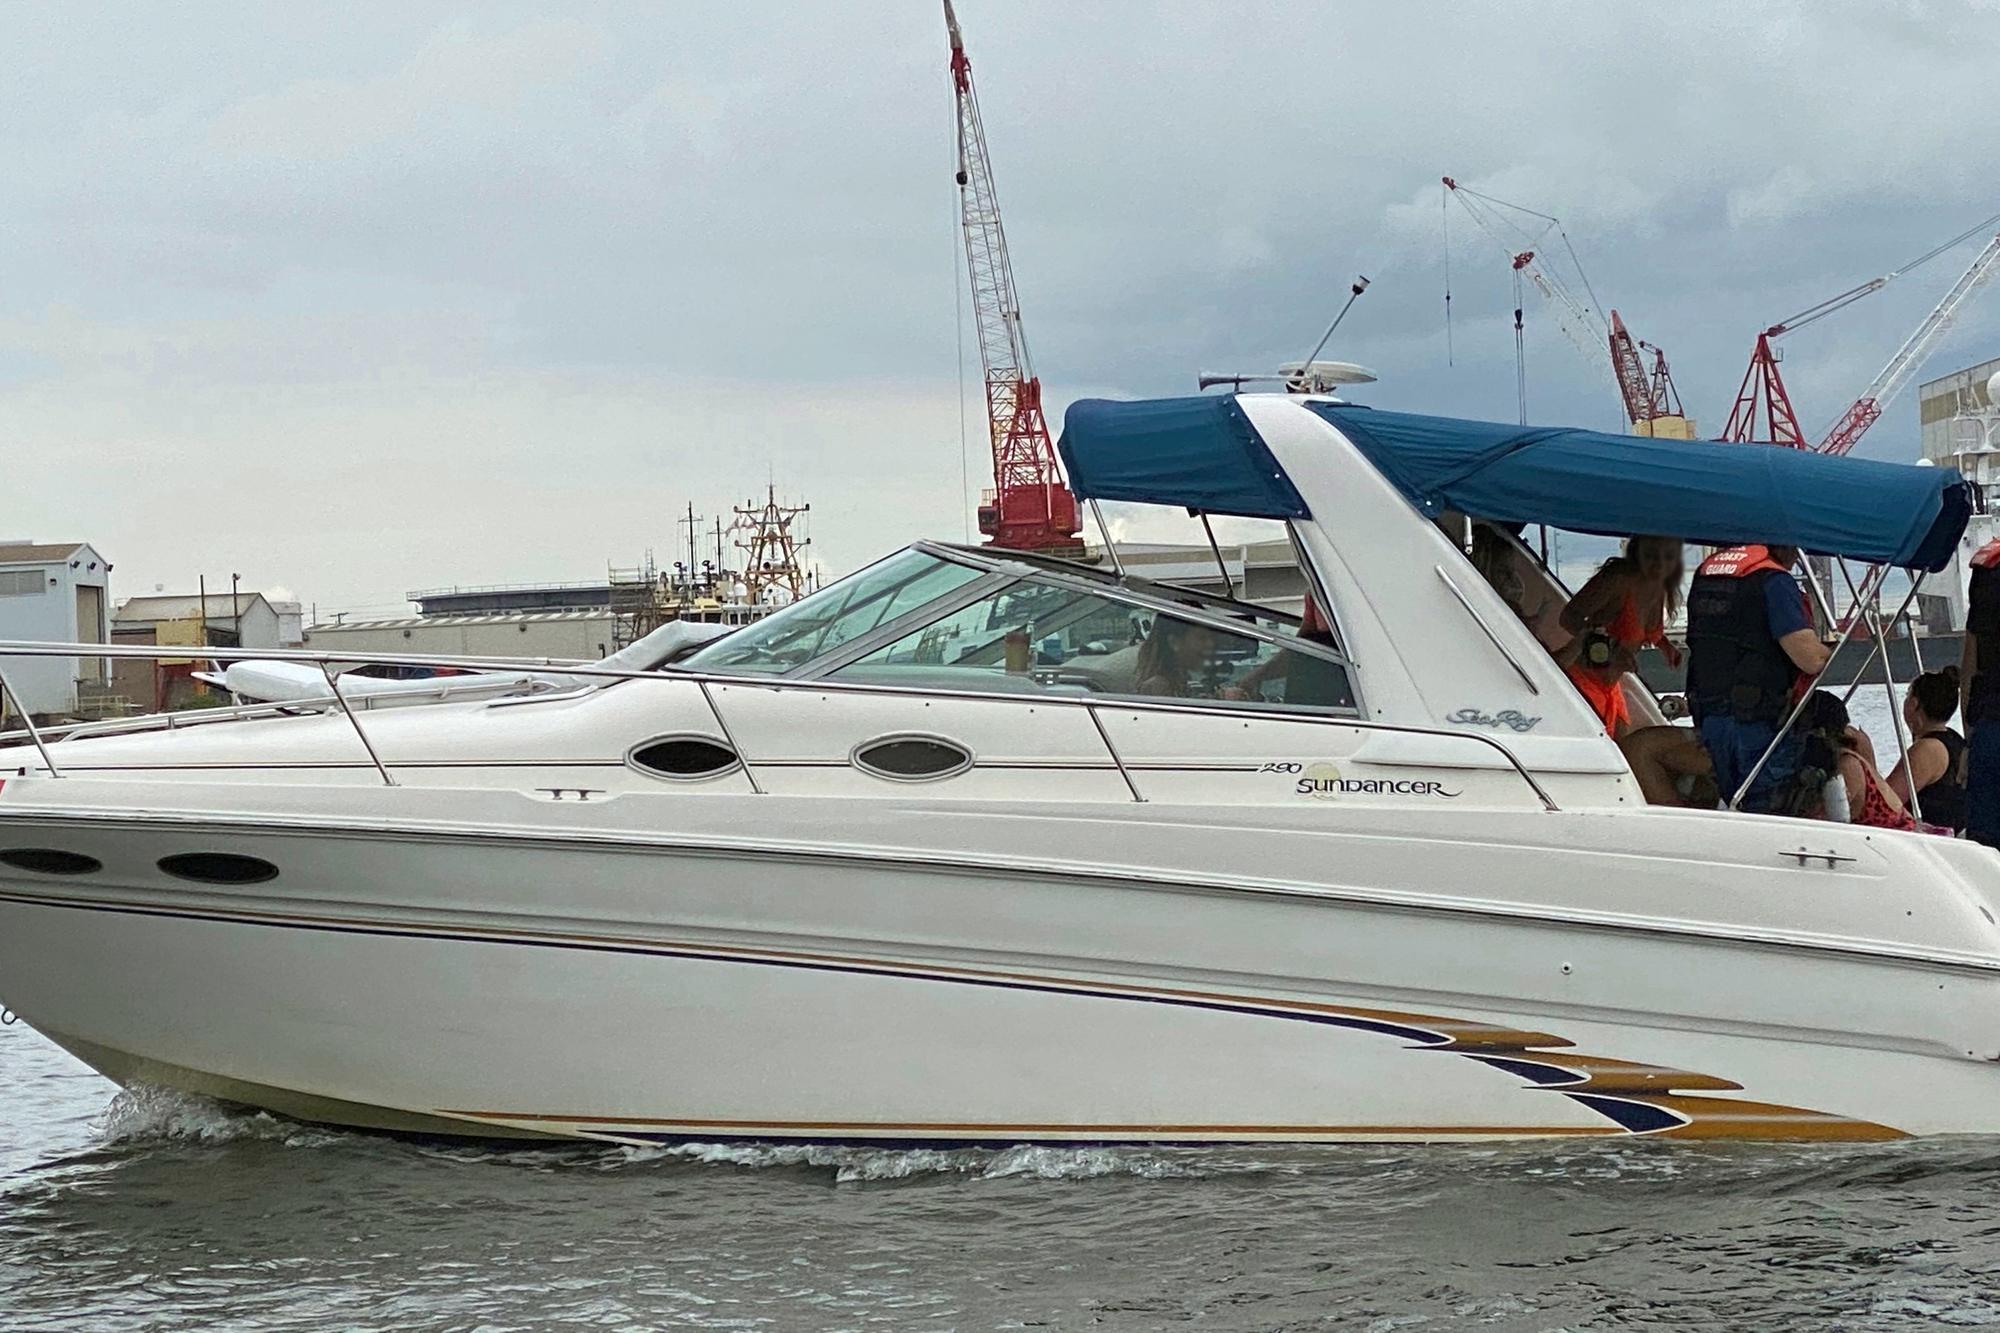 Coast Guard terminates illegal charter nearDavis Island